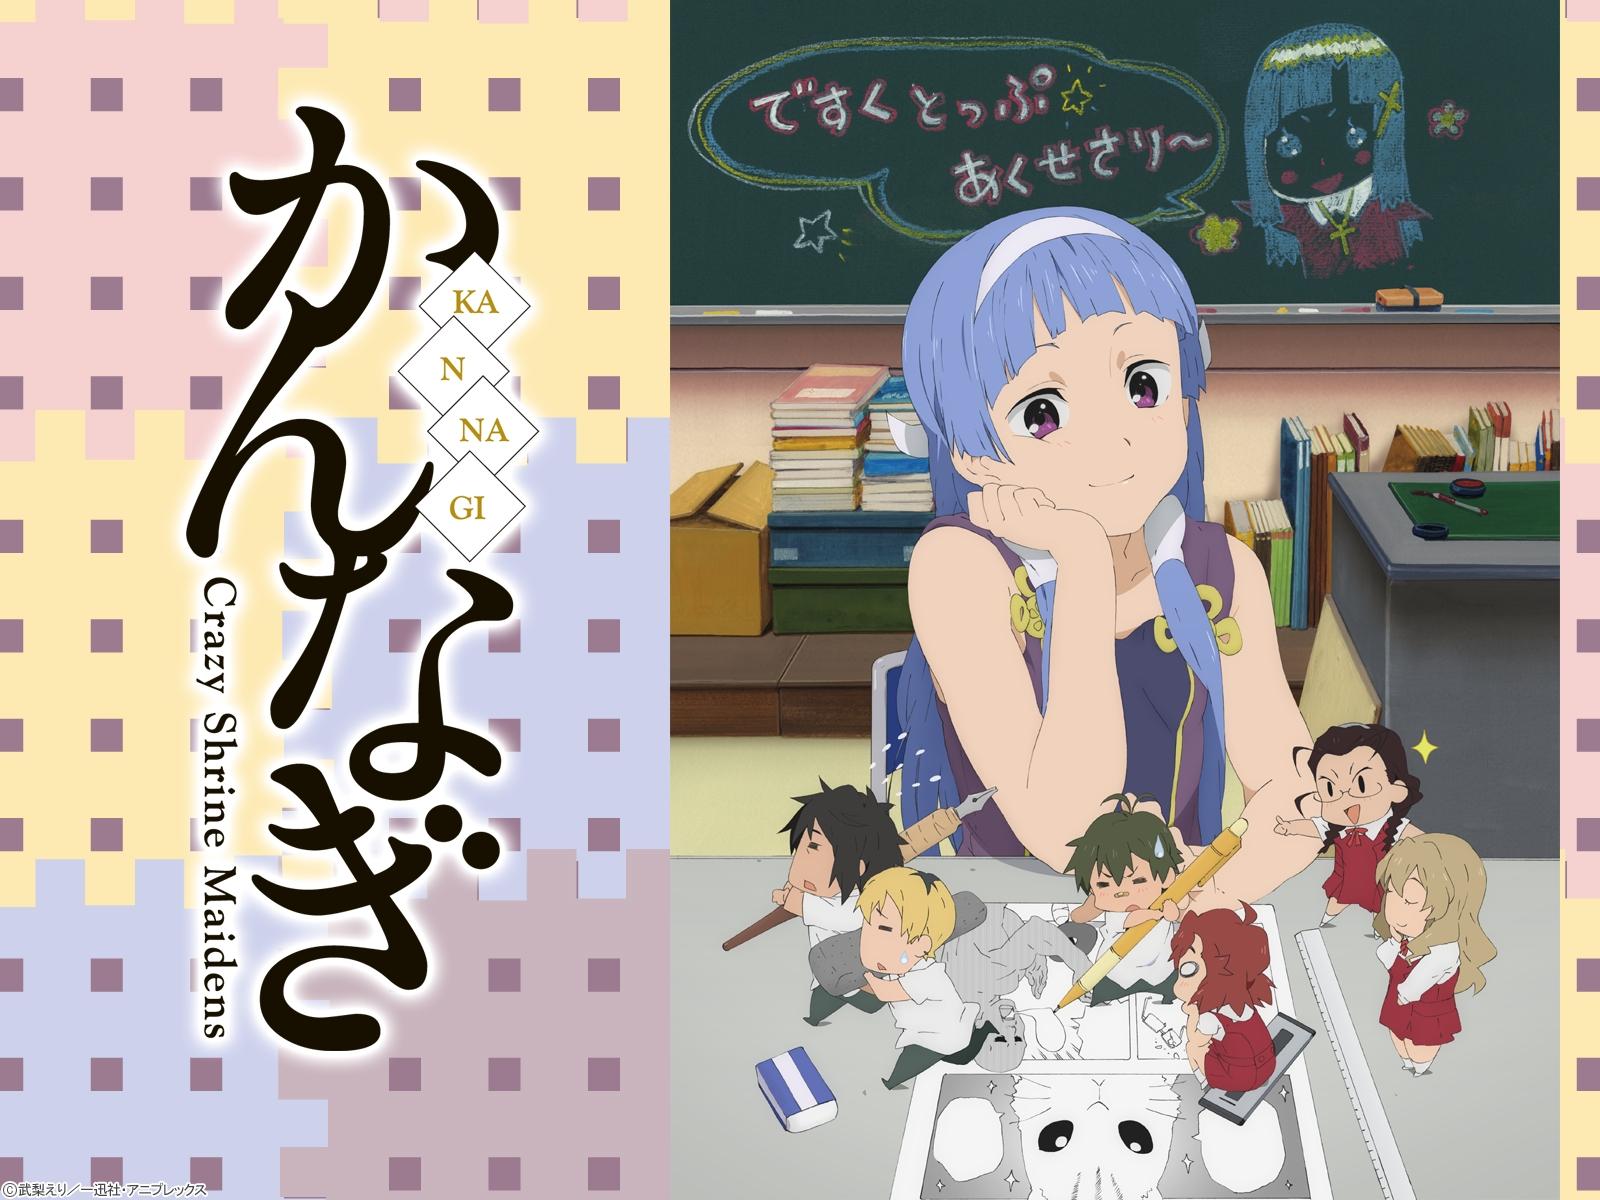 aoba_tsugumi kannagi_crazy_shrine_maidens mikuriya_jin nagi zange